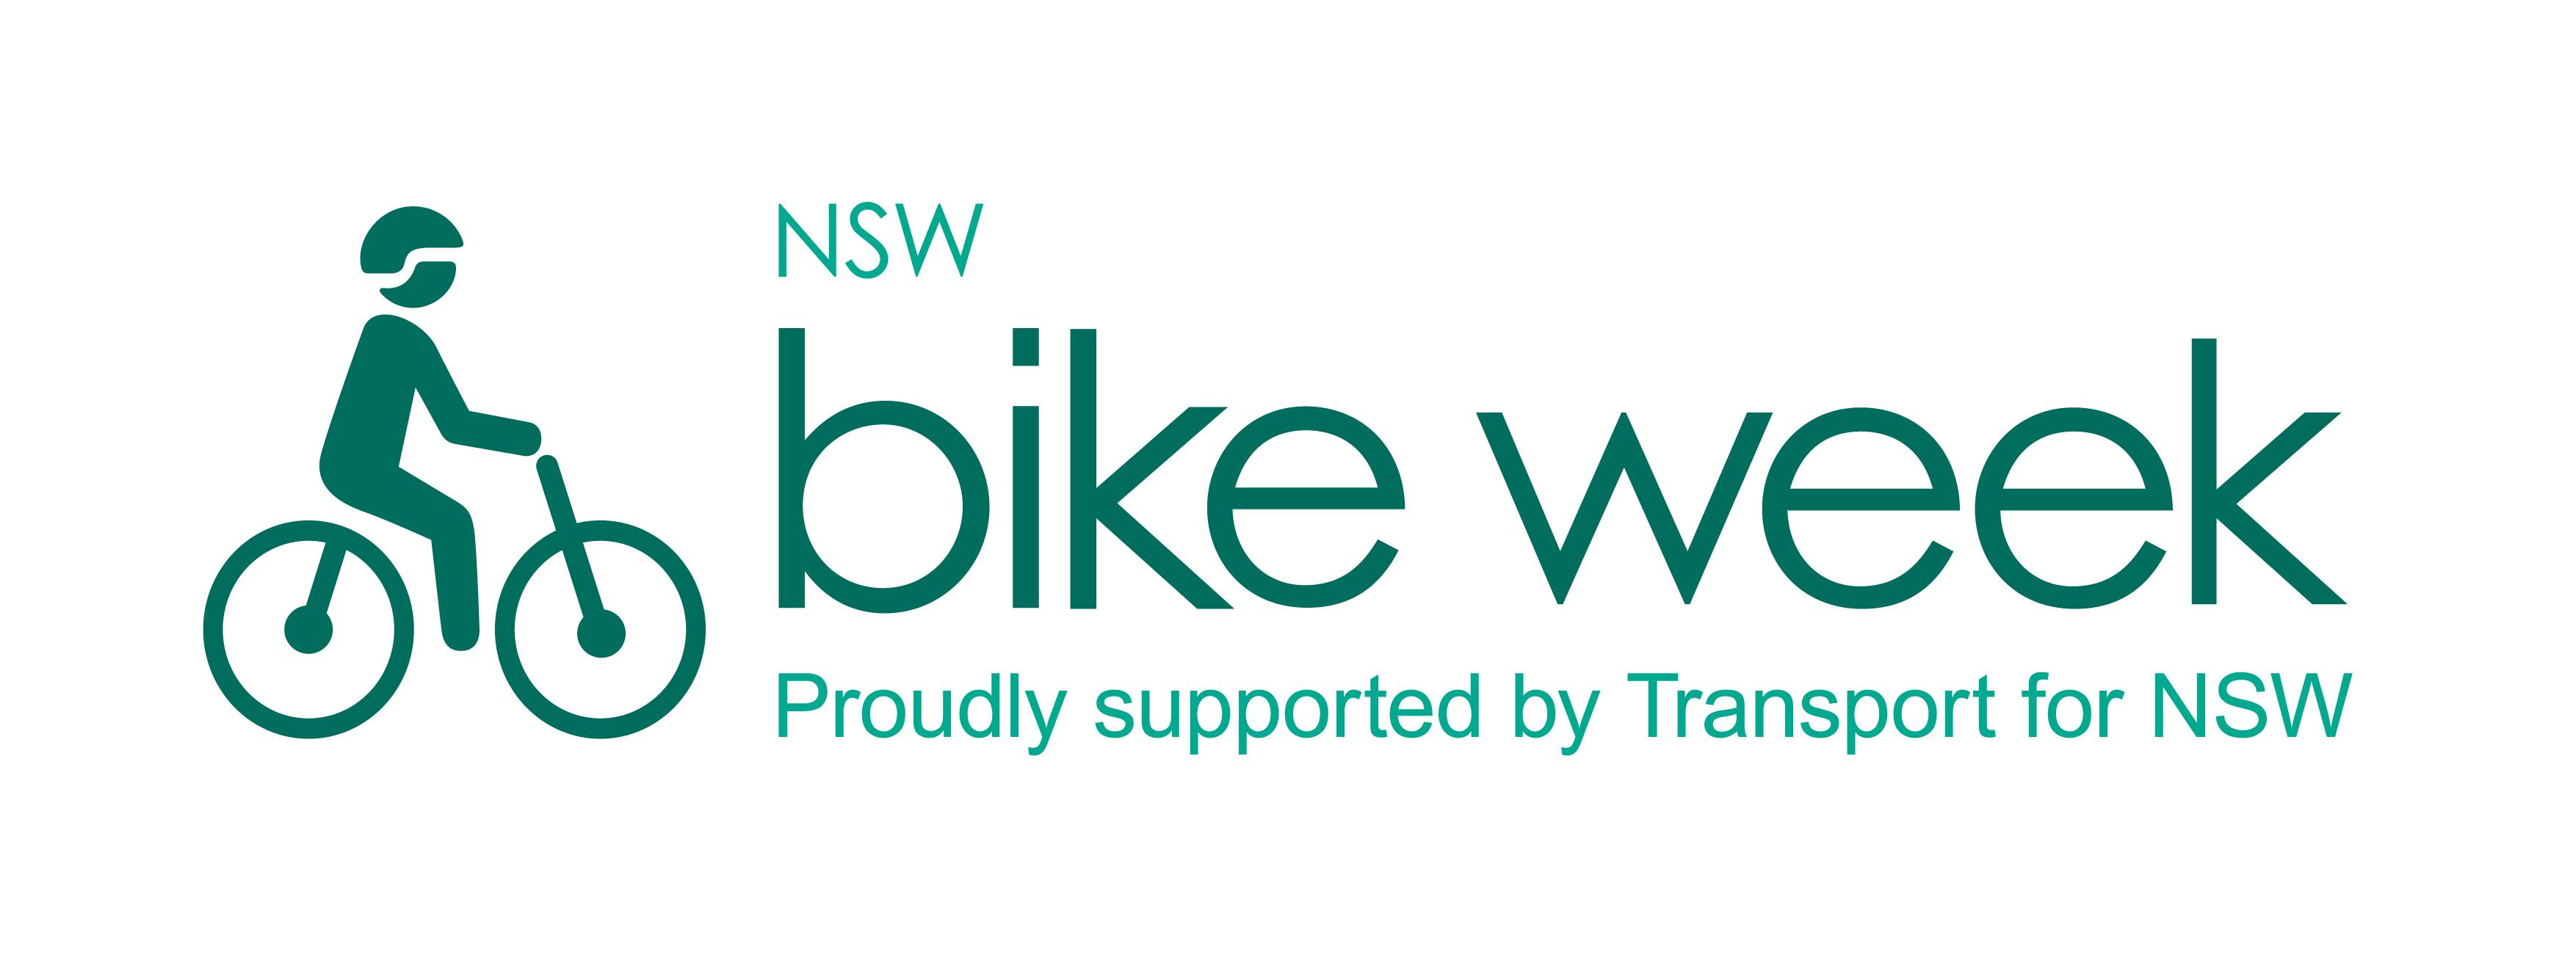 Image result for nsw bike week logo